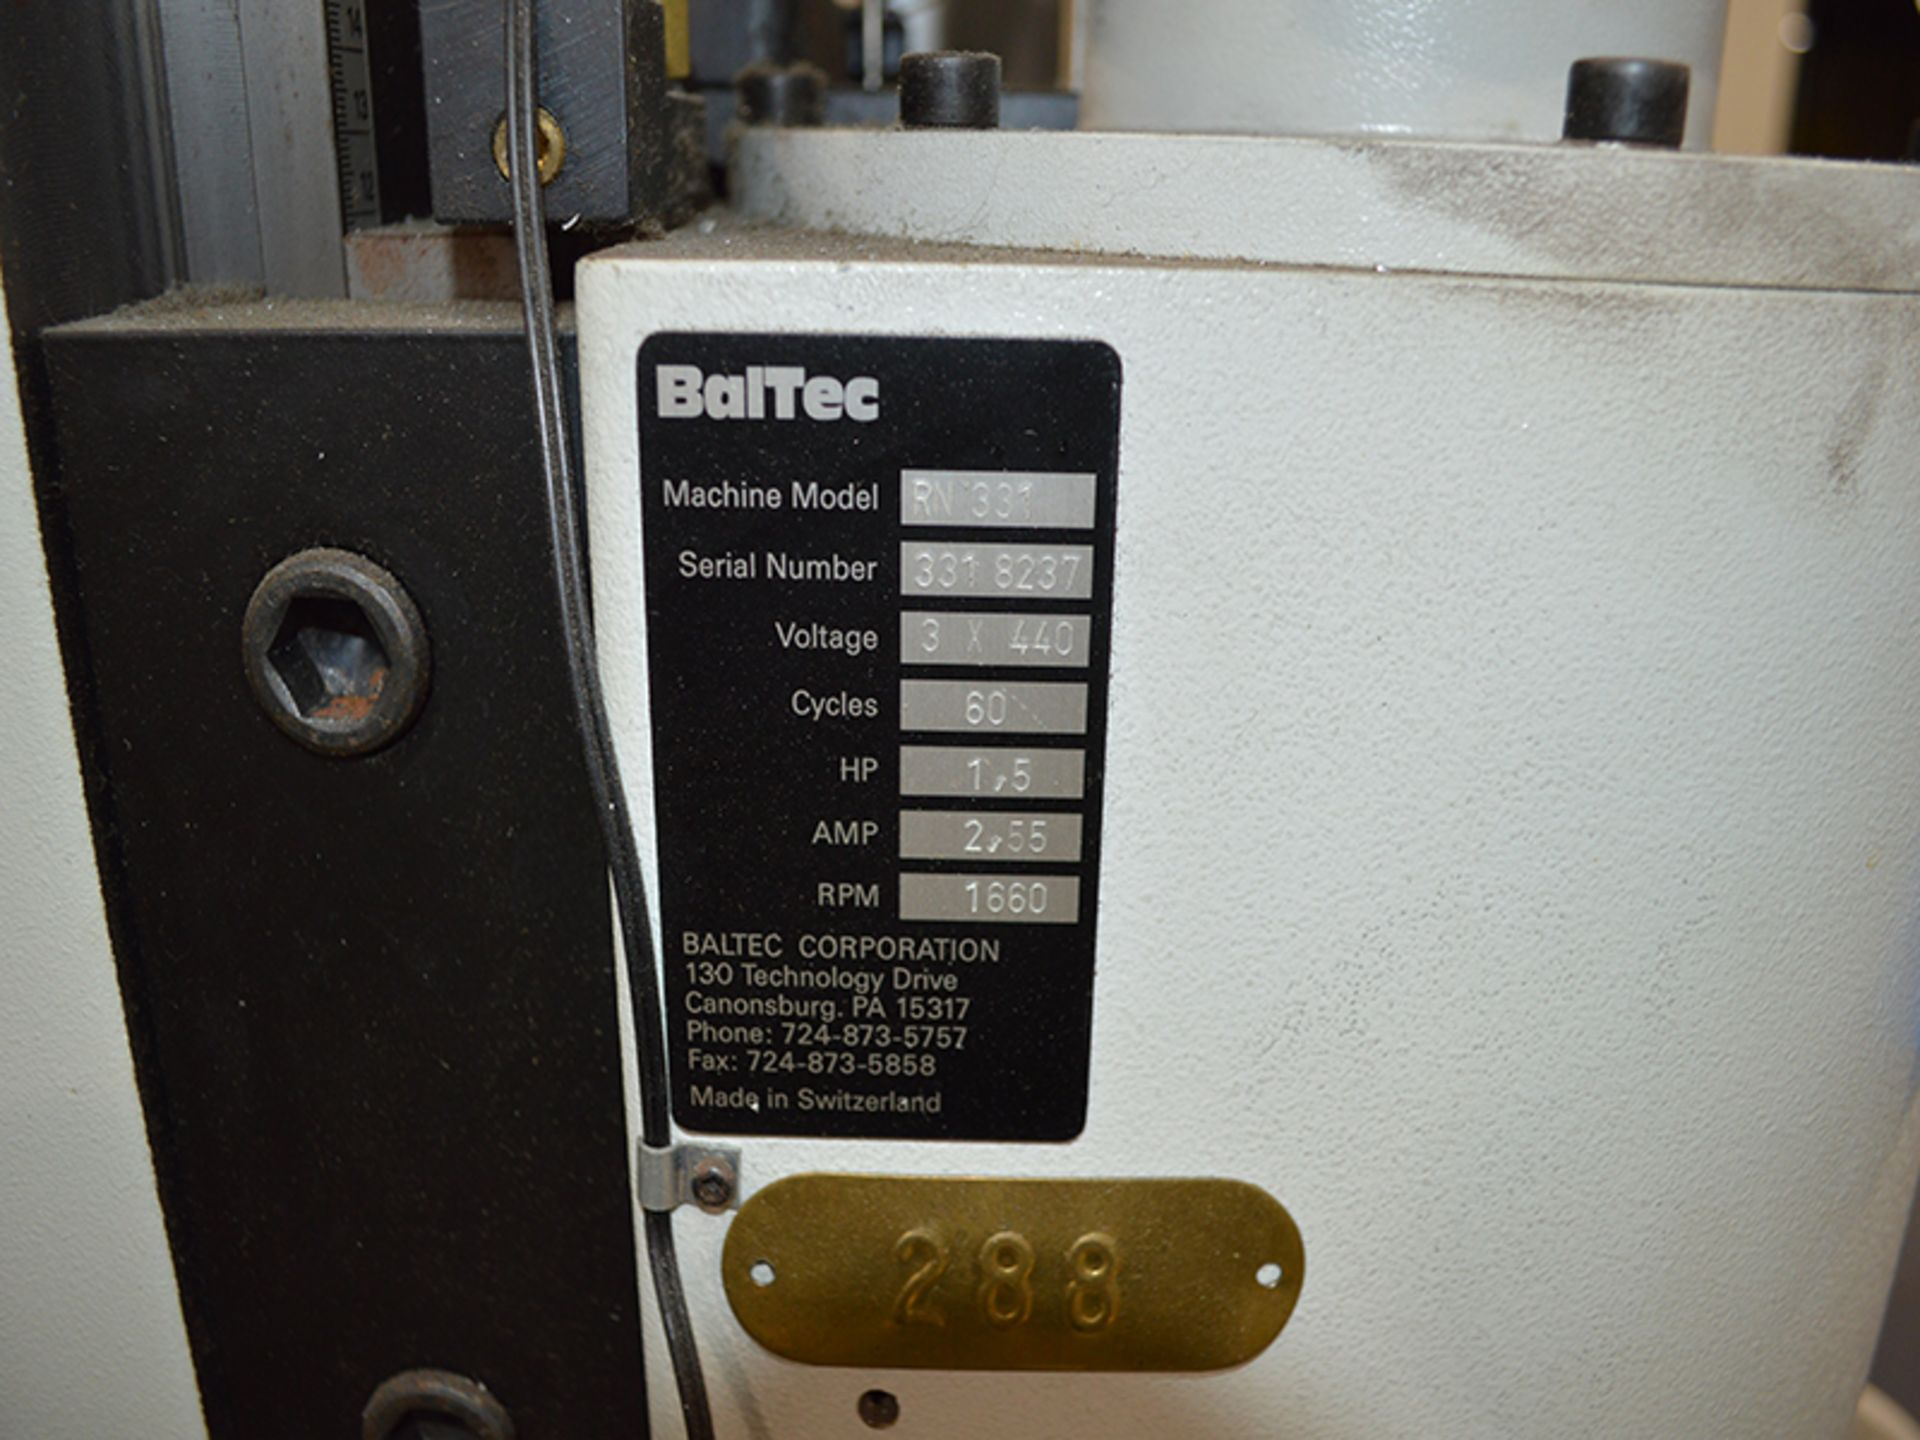 BALTEC BRACKER RN 331 PNEUMATIC RADIAL RIVETER, SN 331 8237 - Image 5 of 5